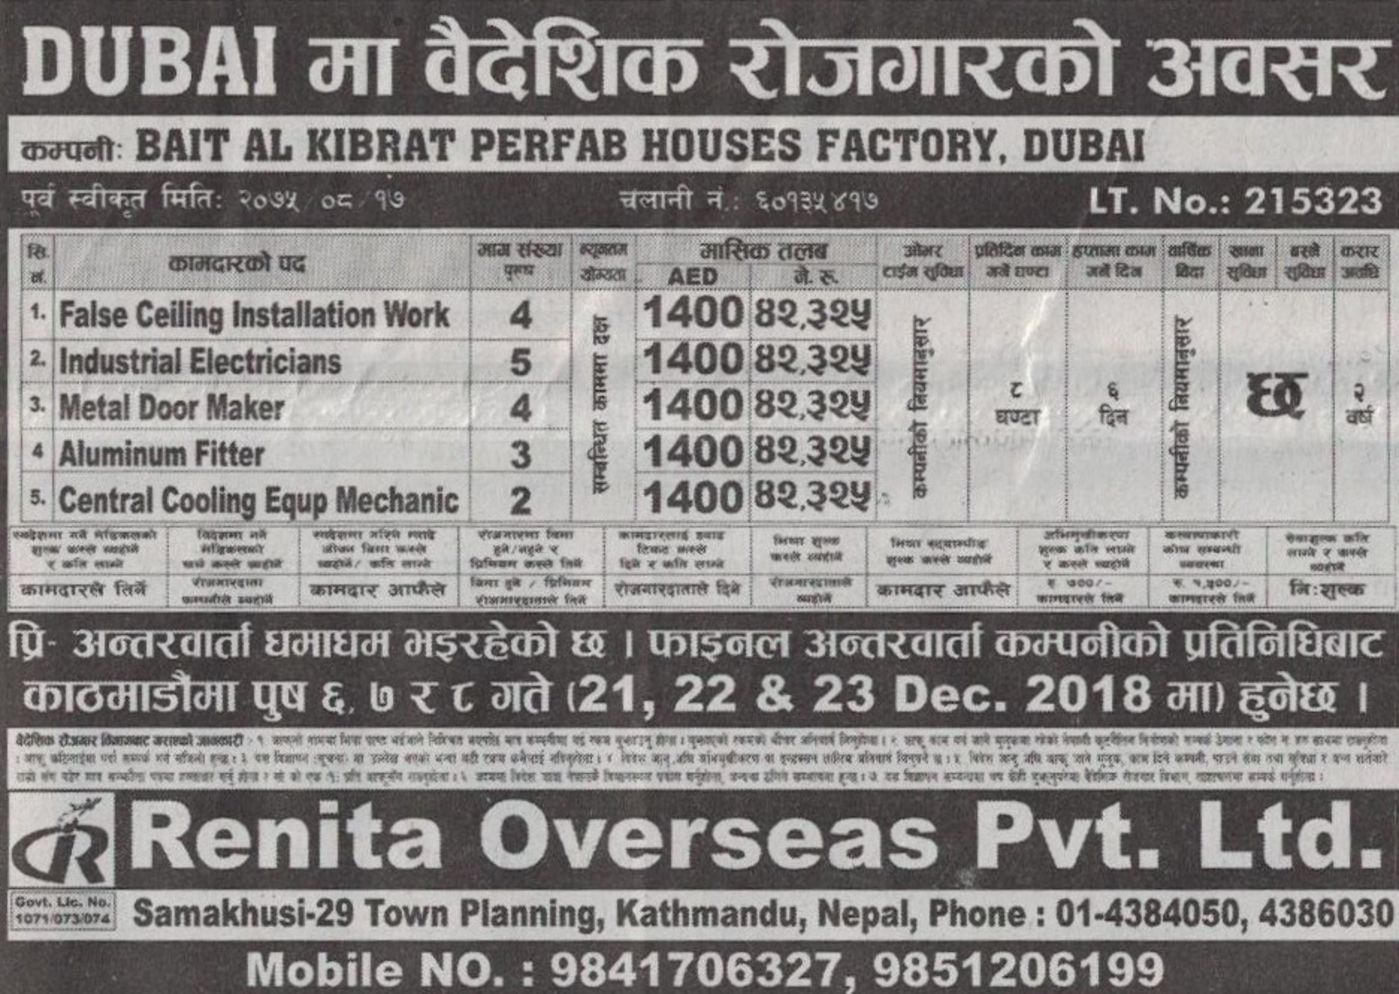 Jobs Nepal - Vacancy - False Celling Installation Work